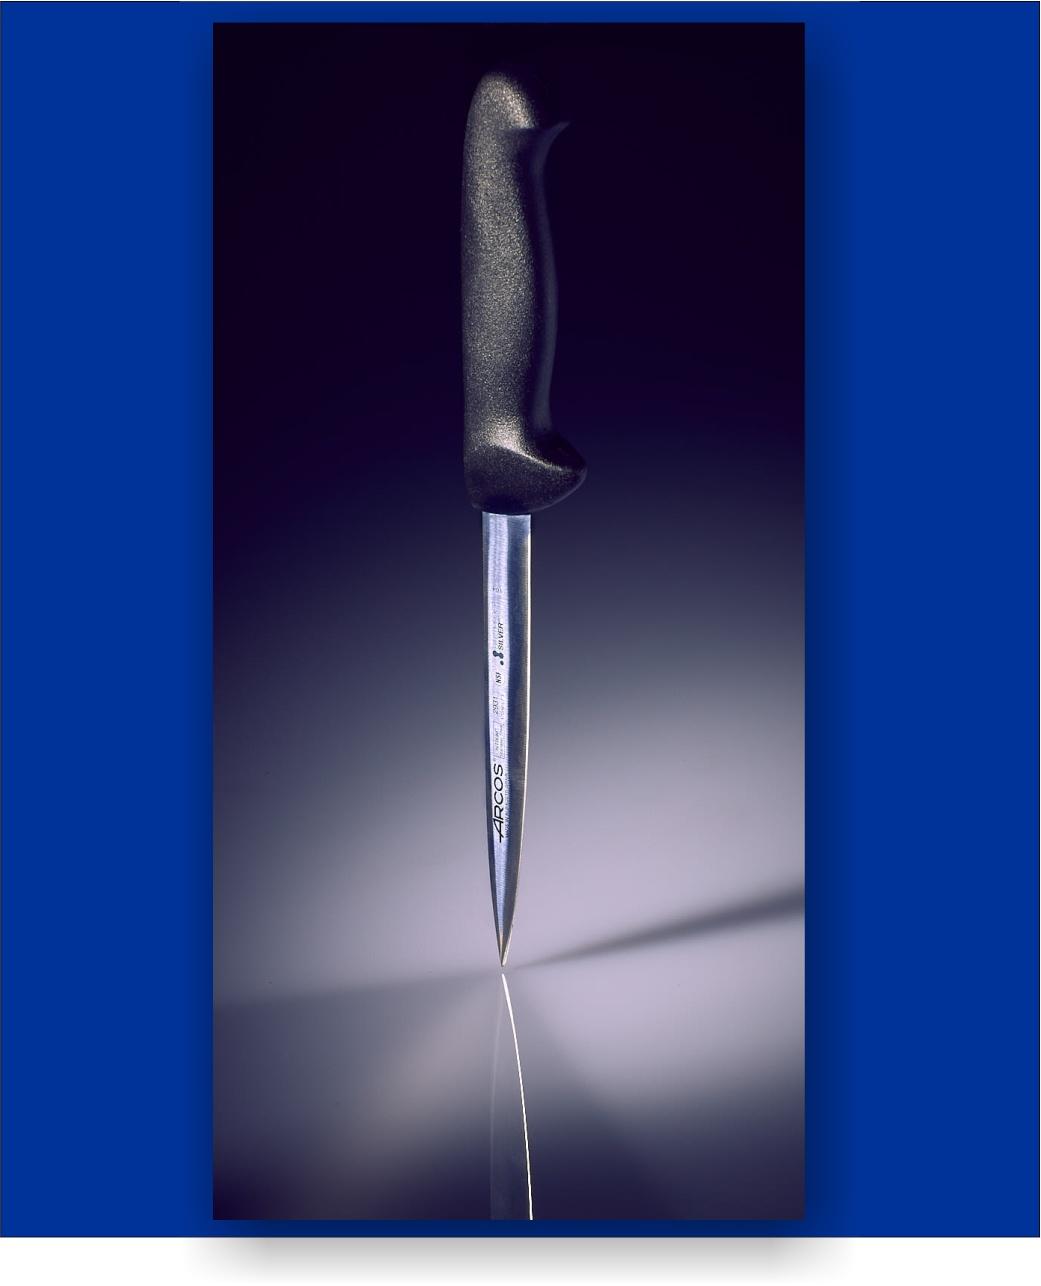 Balancing knife